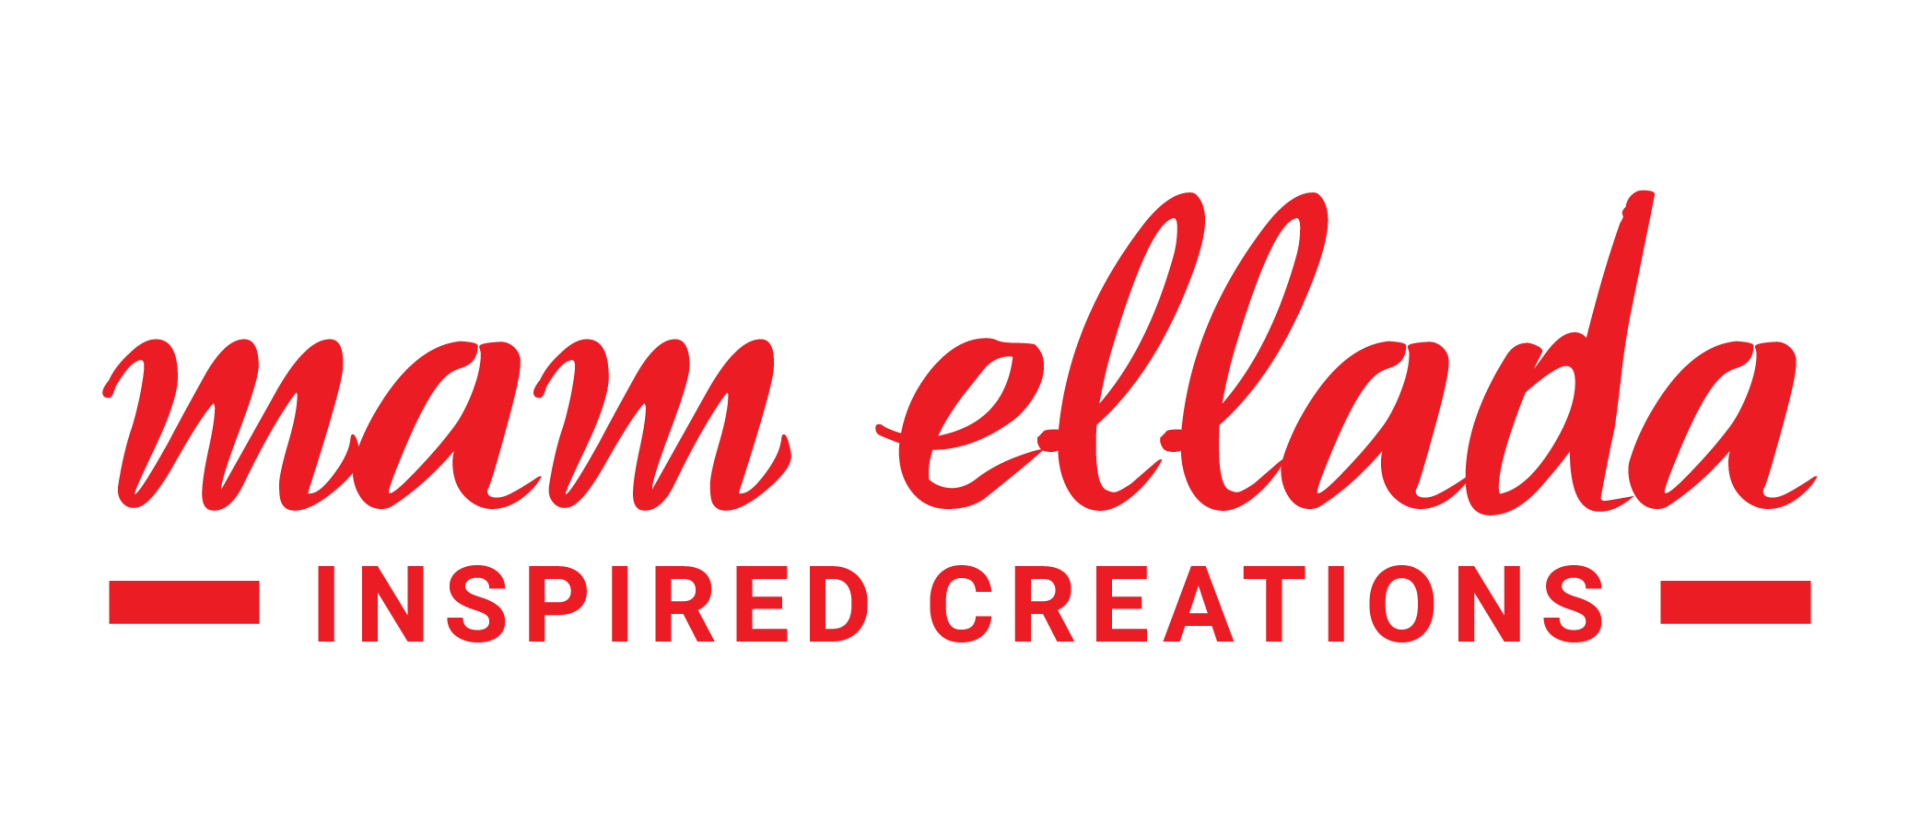 Social media_mamellada__Icon_mamellada_Creations